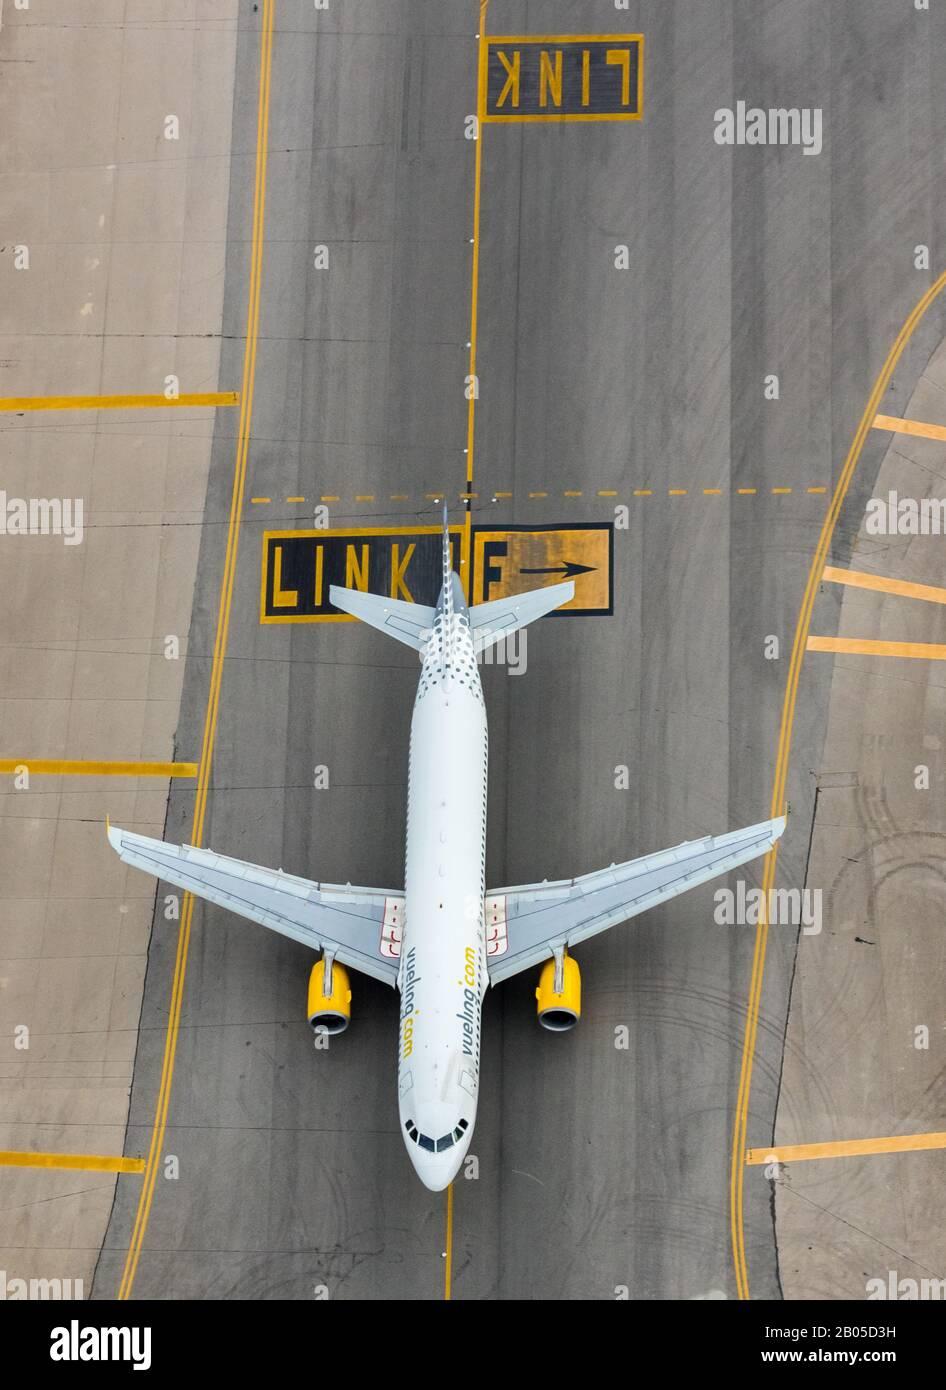 Aeroport de Palma, 09.01.2020, aerial photo, Spain, Balearic Islands, Majorca, Palma Stock Photo